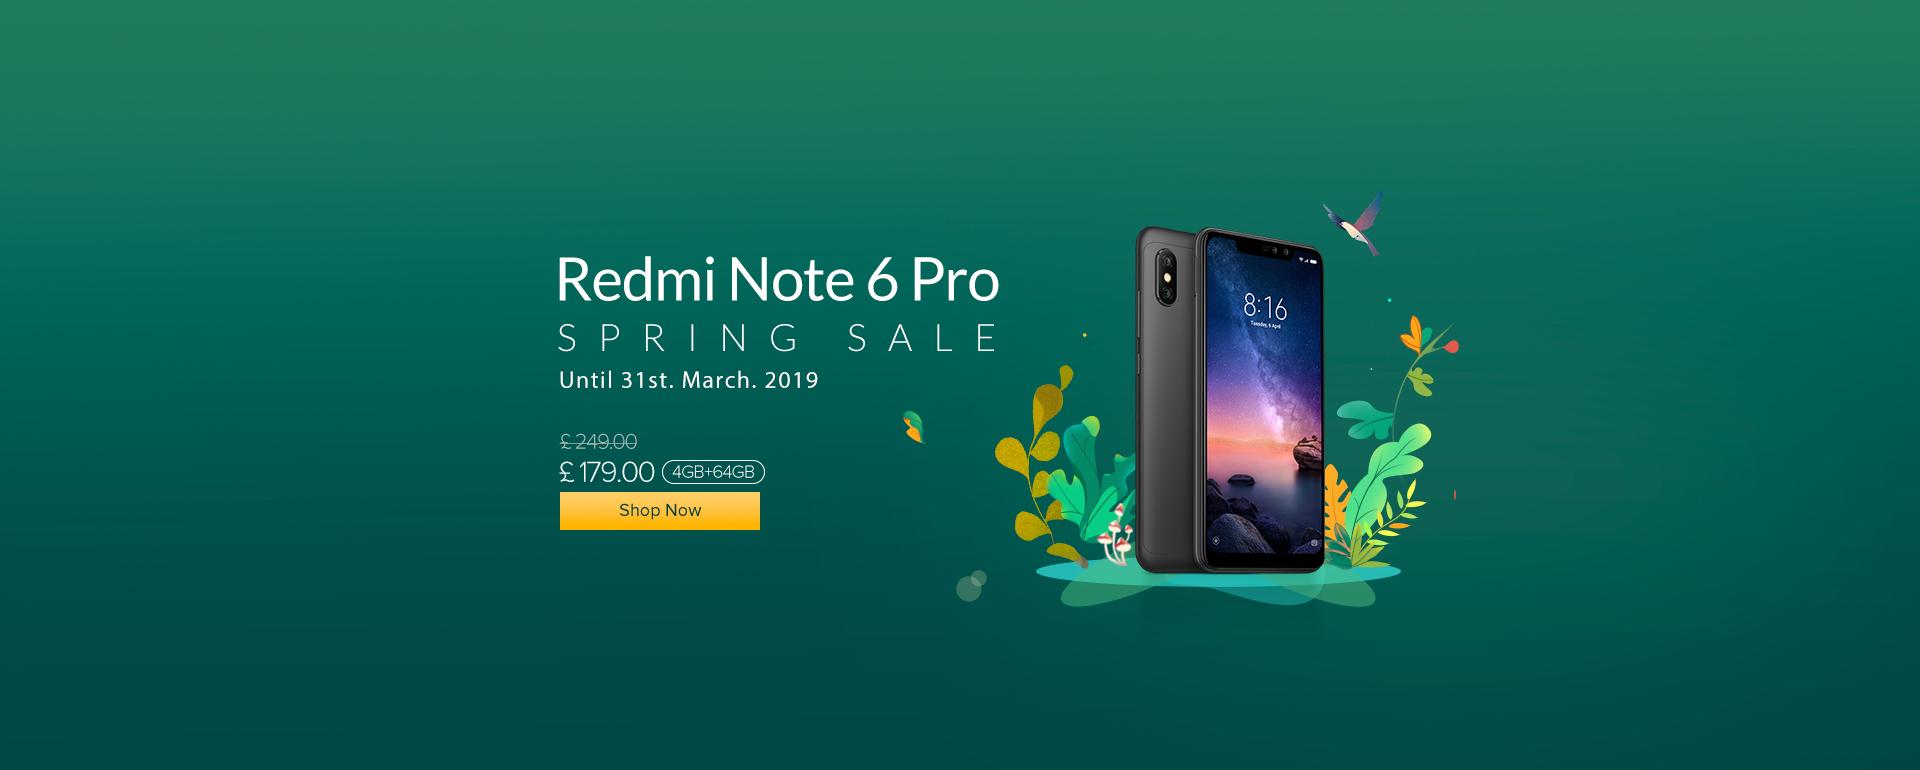 SP-Redmi Note 6 Pro